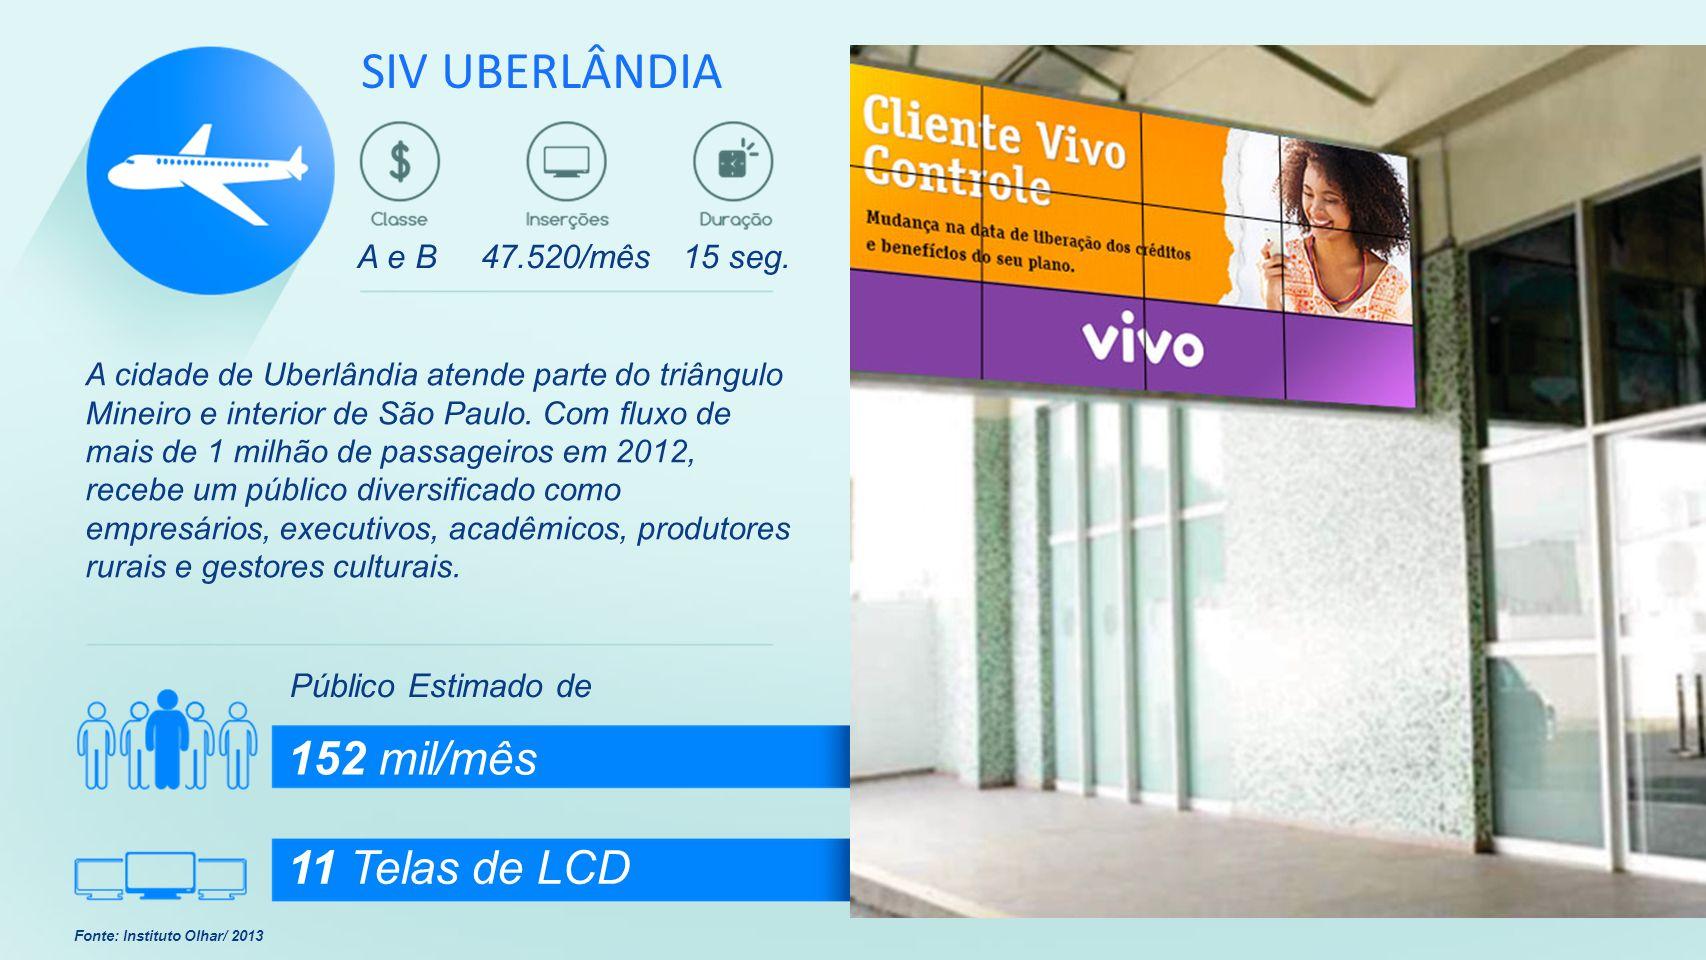 SIV UBERLÂNDIA 152 mil/mês 11 Telas de LCD A e B 47.520/mês 15 seg.